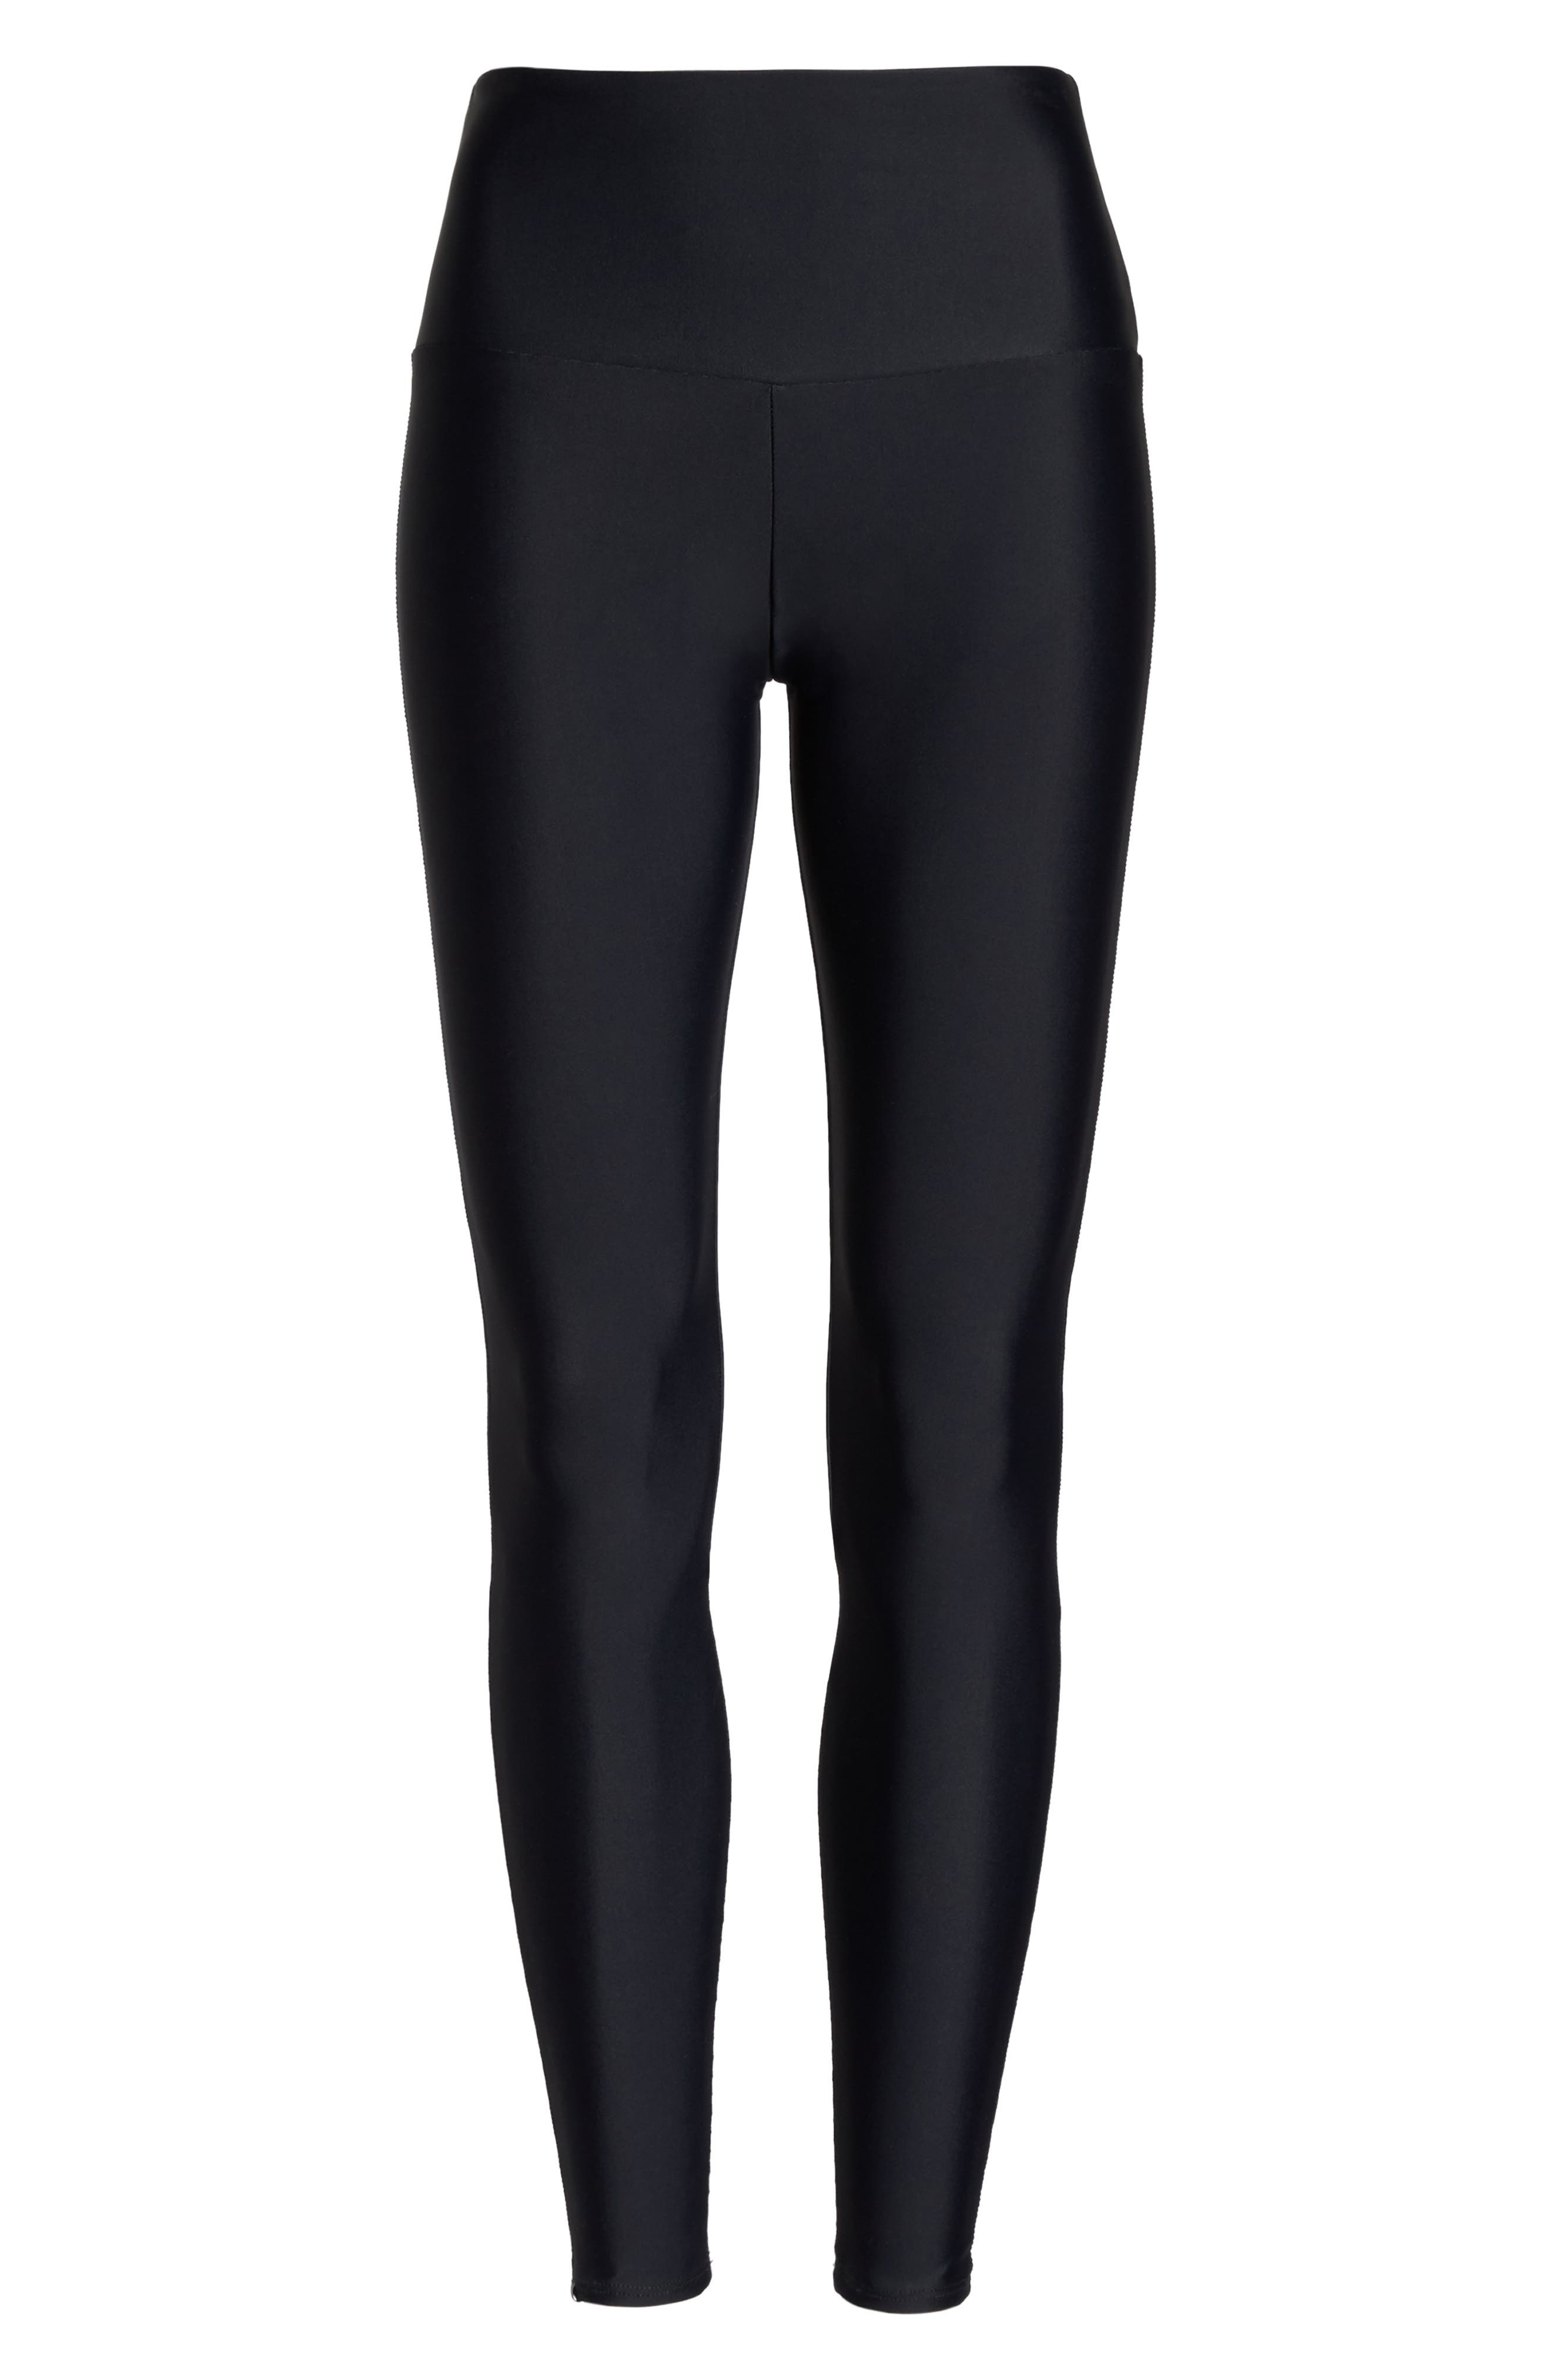 High Rise Yoga Pants,                             Alternate thumbnail 7, color,                             001